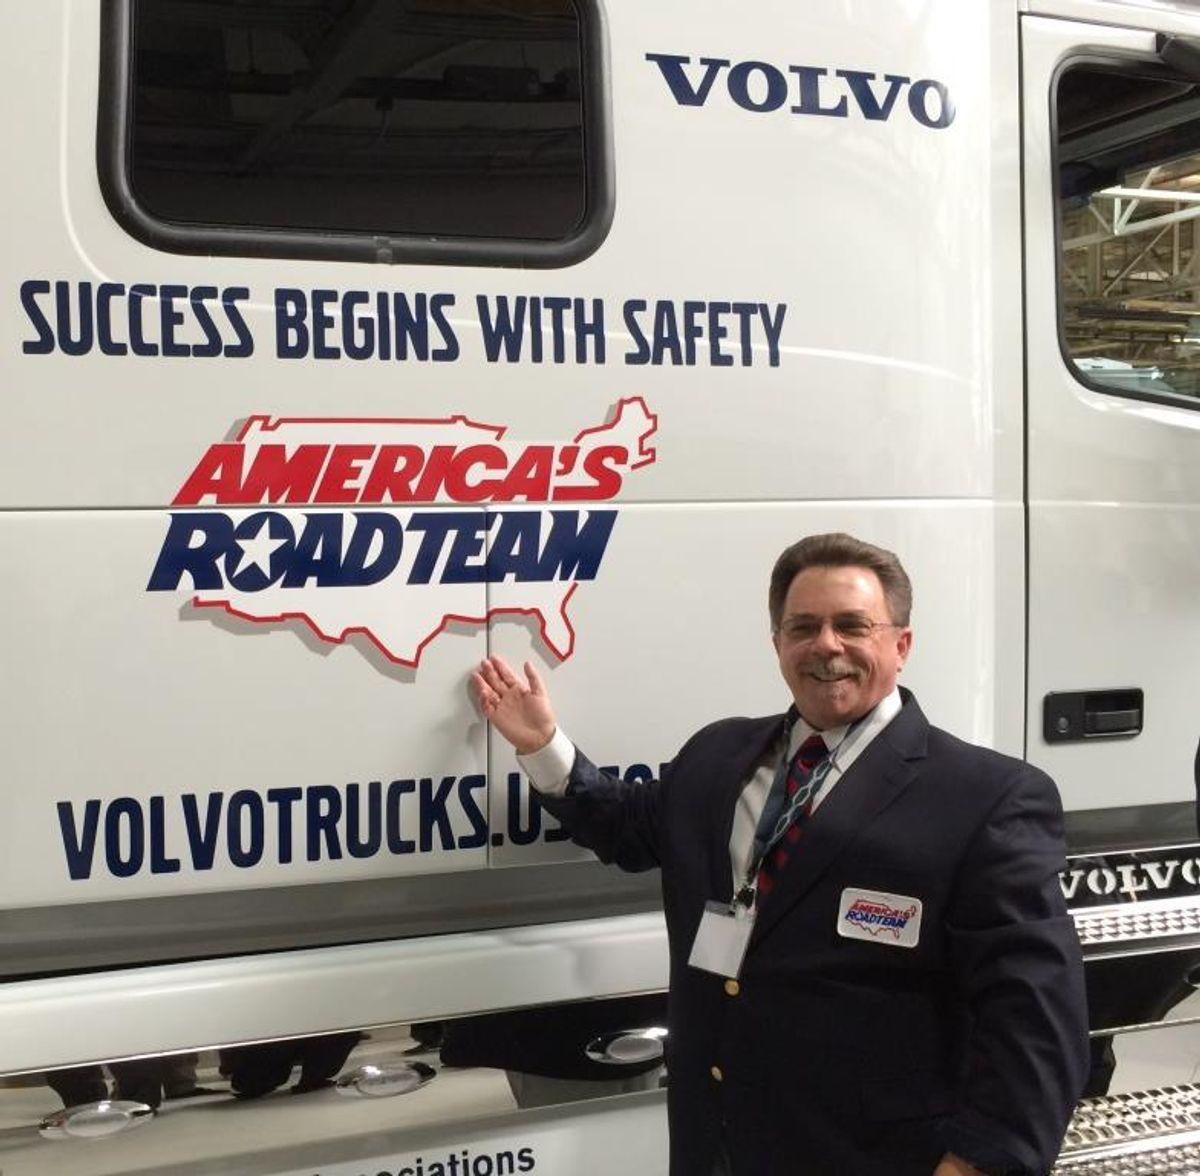 Penske Logistics' Neil Kirk Named ATA America's Road Team Captain